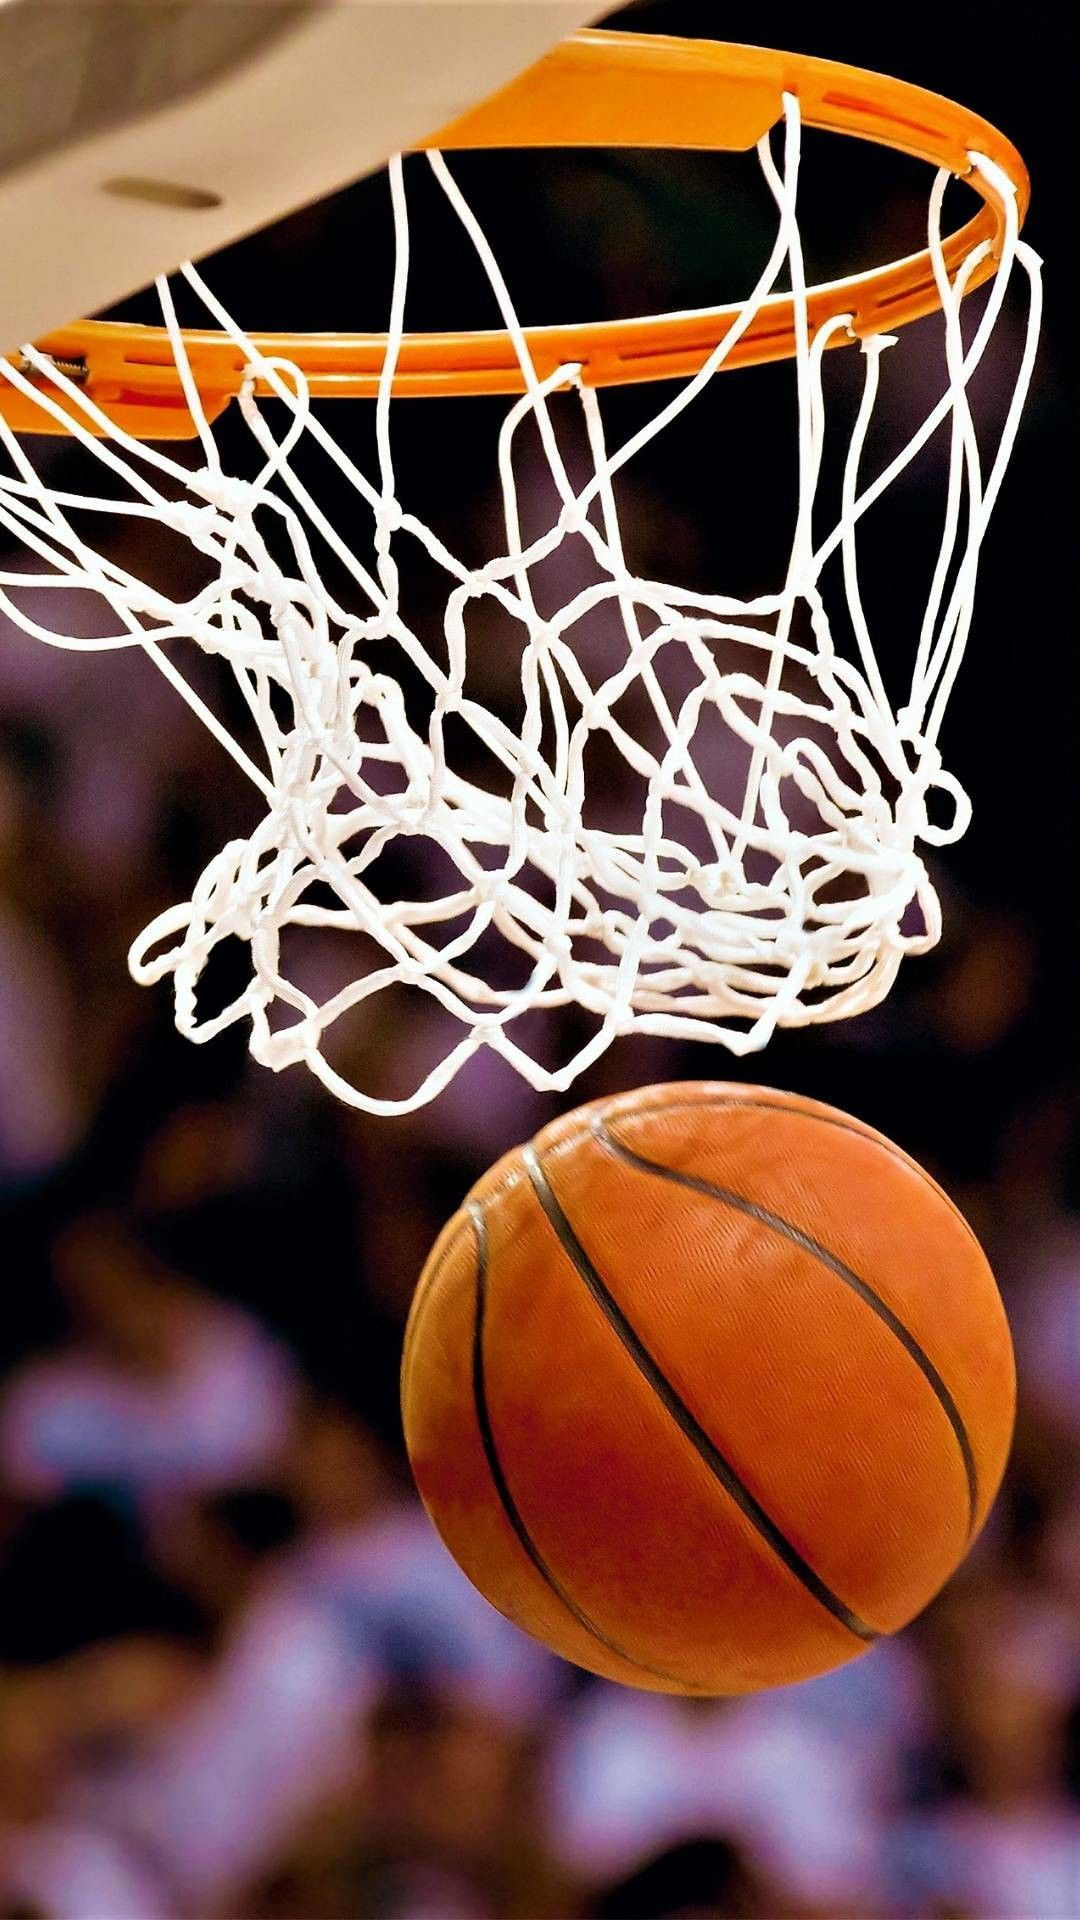 Basketball Phone Wallpapers   Top Basketball Phone 1080x1920